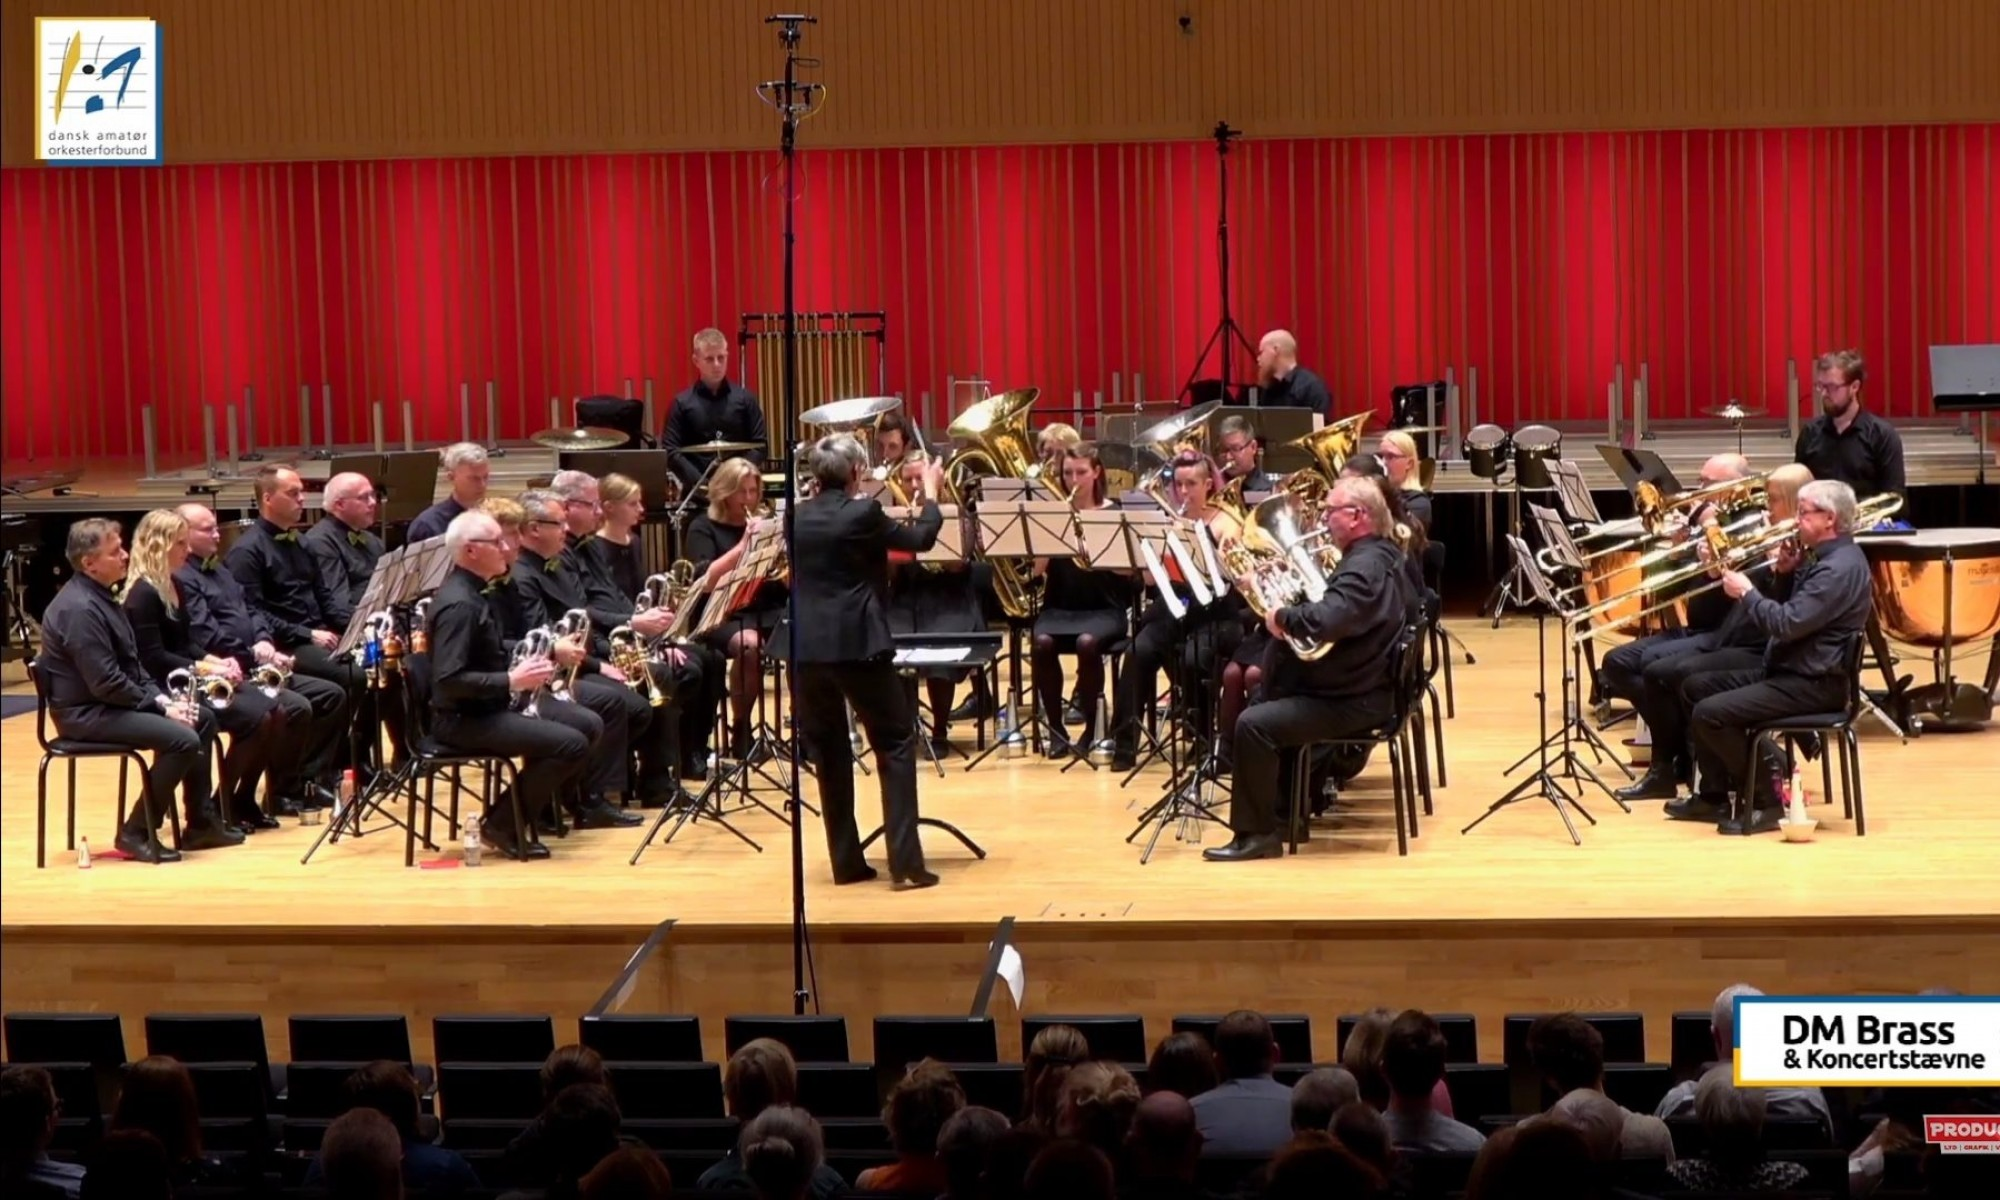 Skanderborg Brass Band